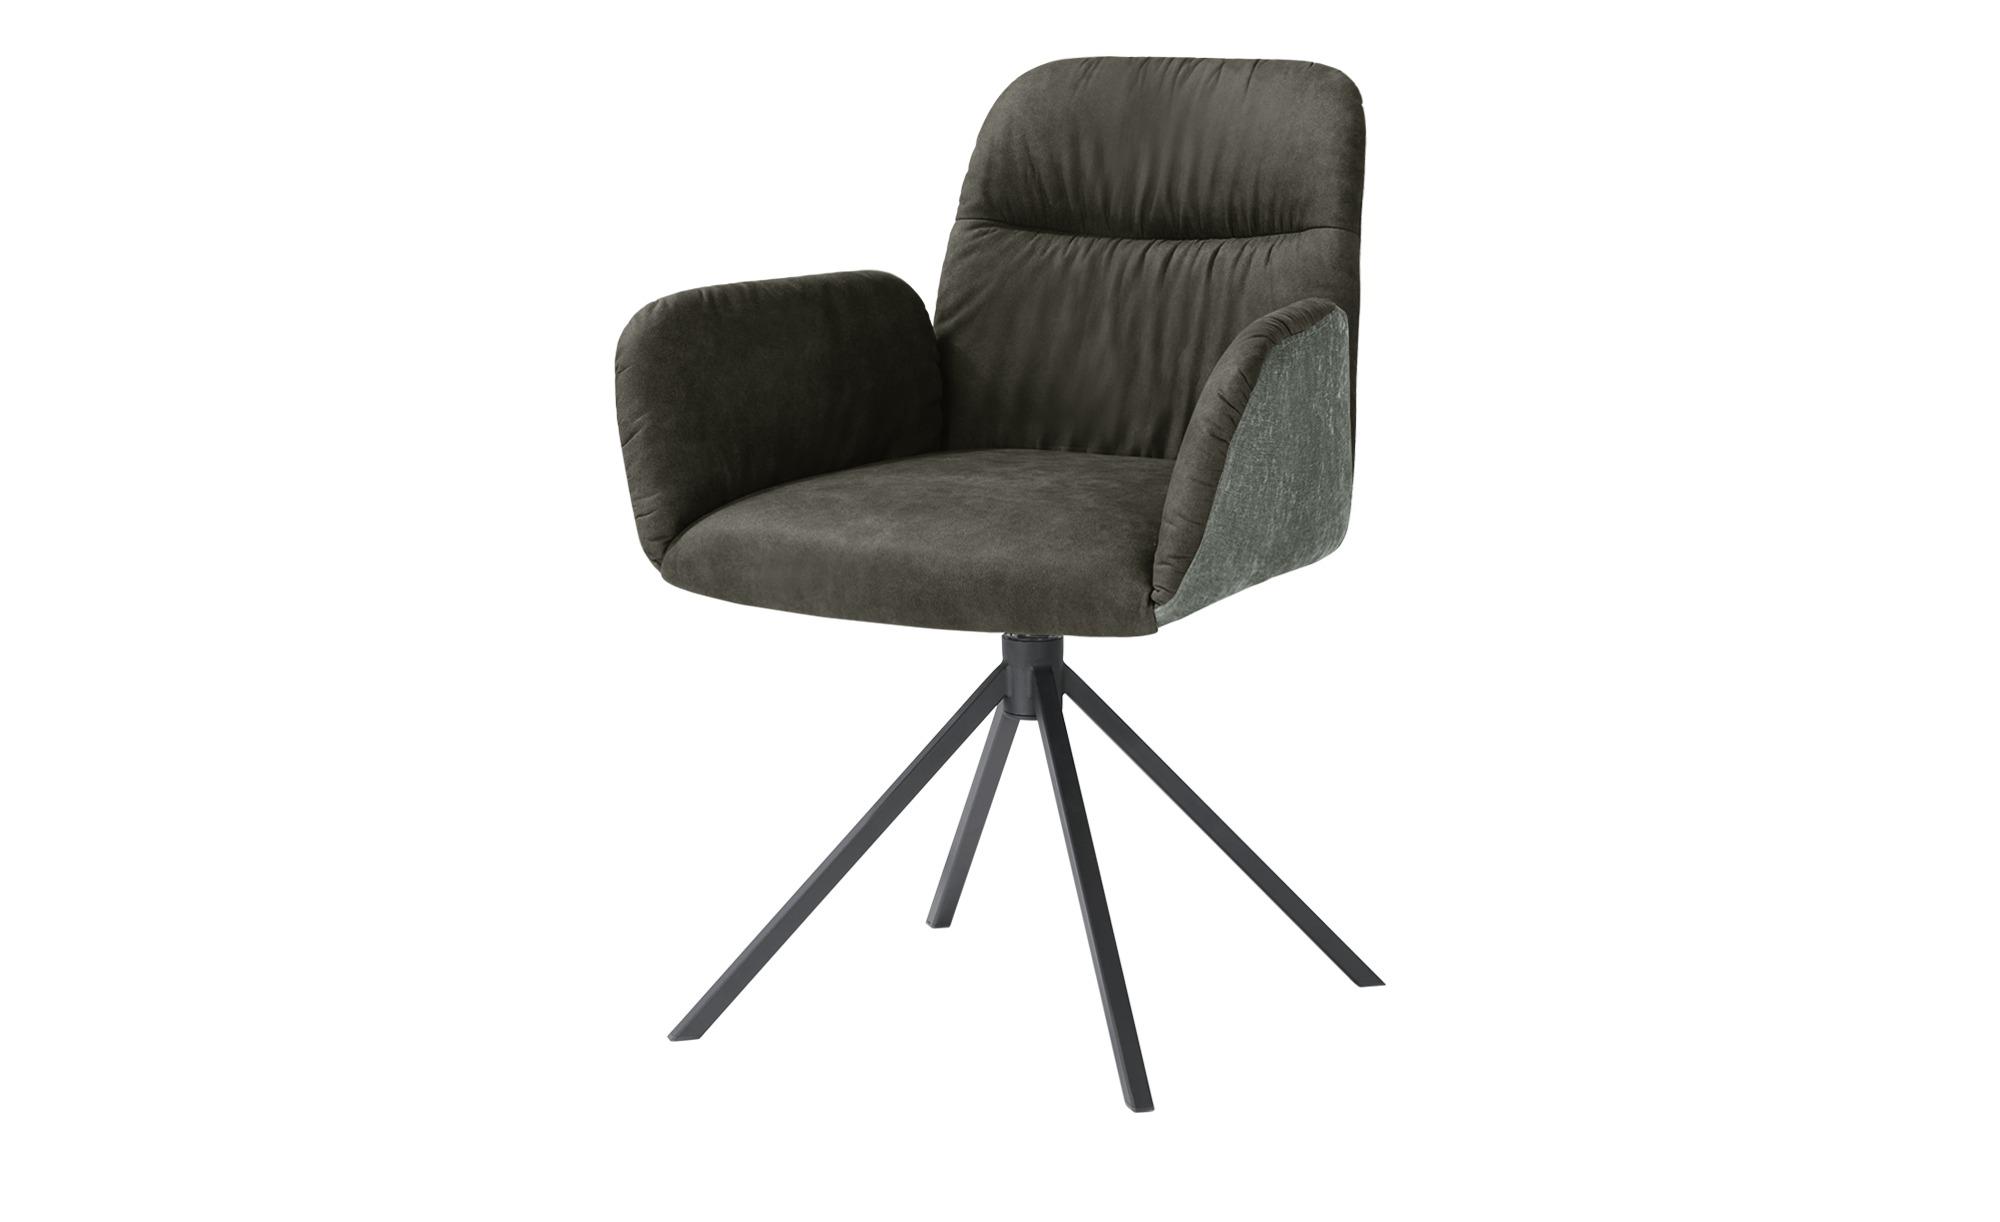 uno Polster-Armlehnstuhl  Sevan ¦ grau Stühle > Esszimmerstühle > Esszimmerstühle mit Armlehnen - Höffner